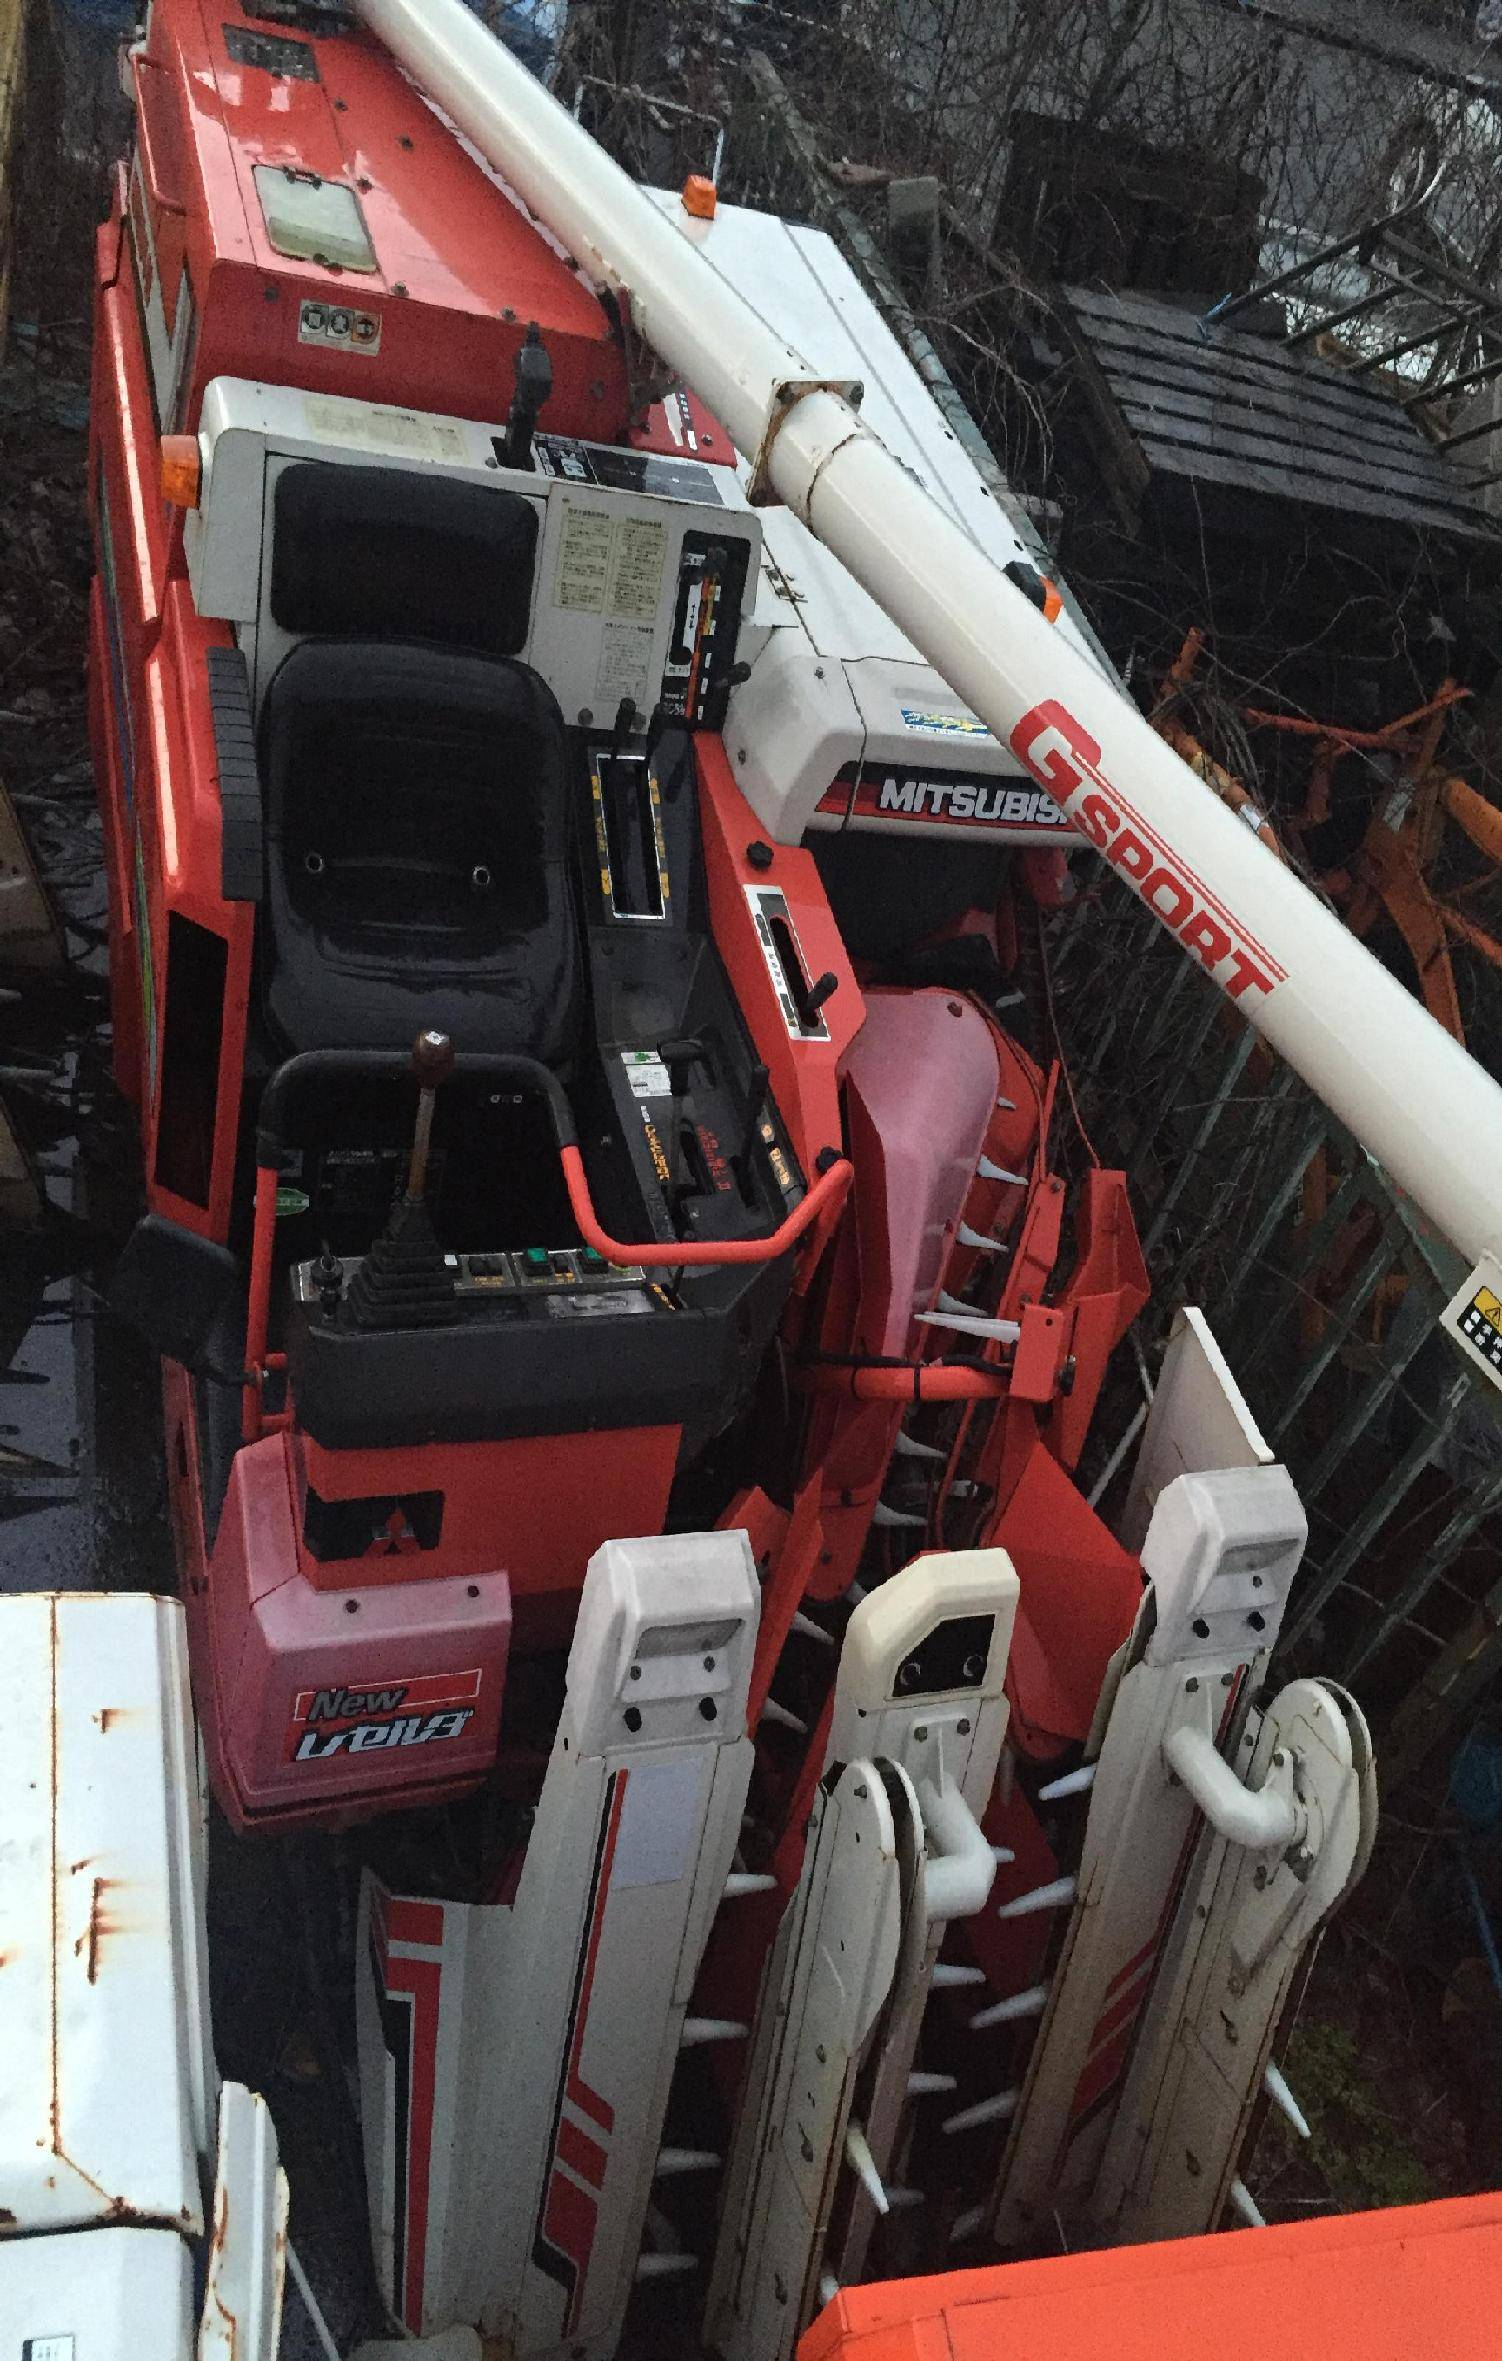 Used combine harvester Mitsubishi MC24G